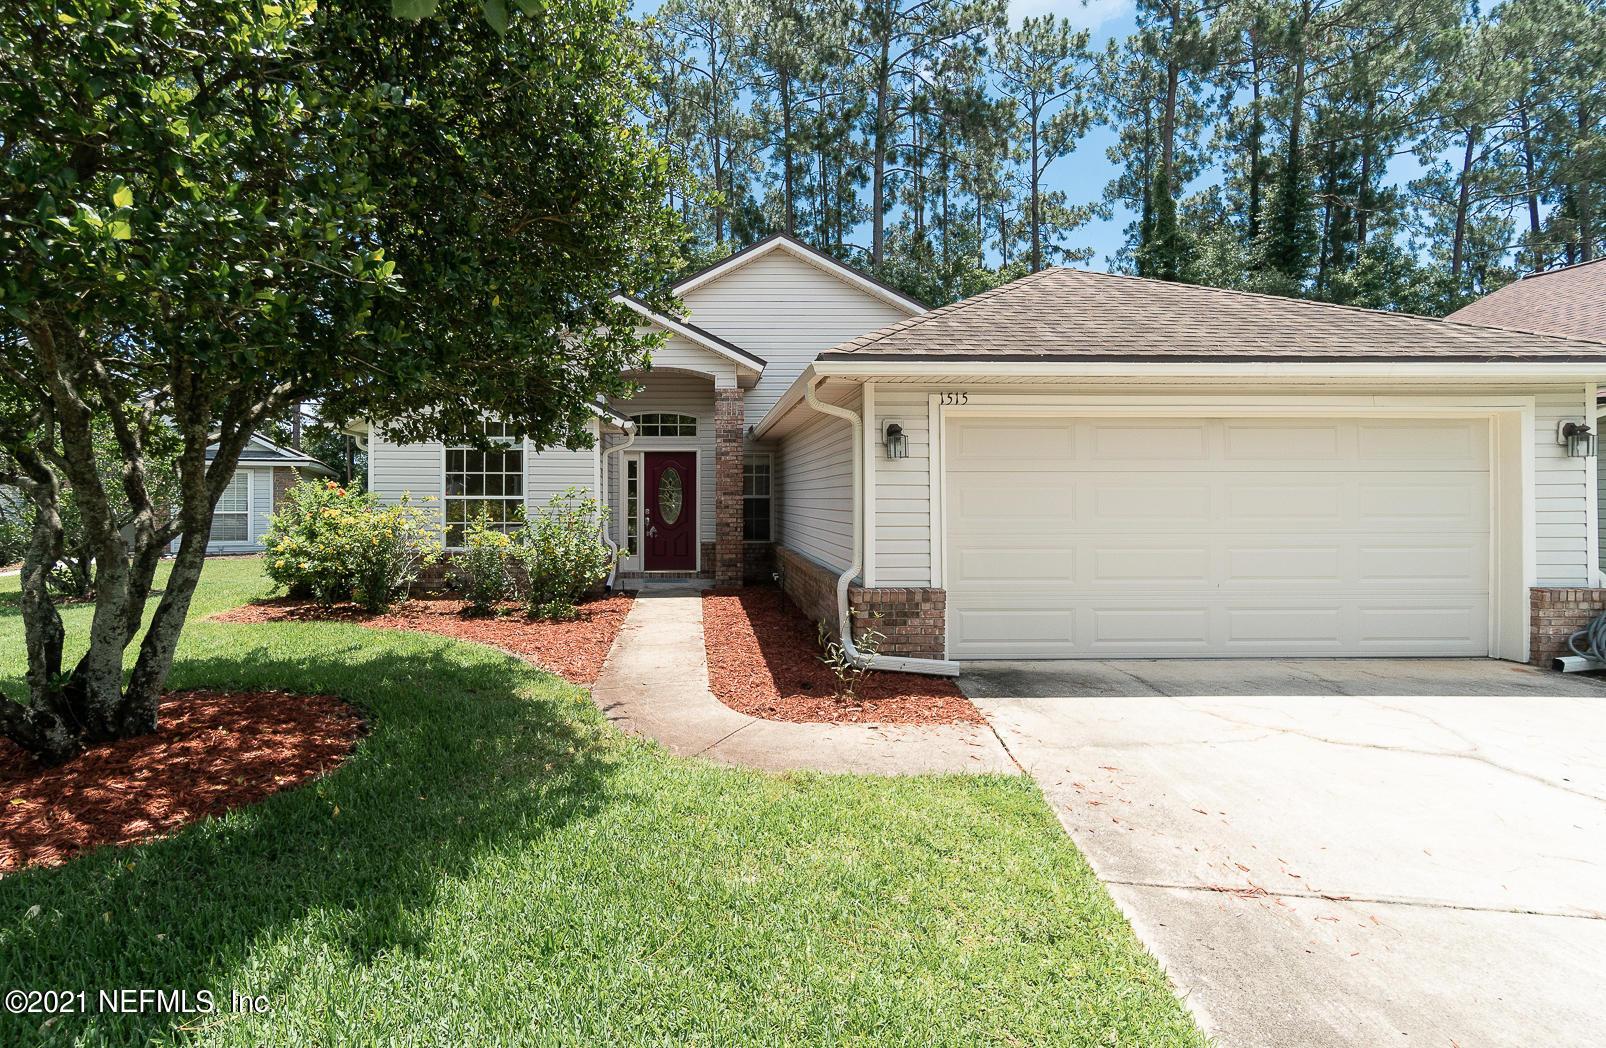 1515 LINKSIDE, ORANGE PARK, FLORIDA 32003, 3 Bedrooms Bedrooms, ,2 BathroomsBathrooms,Residential,For sale,LINKSIDE,1114866